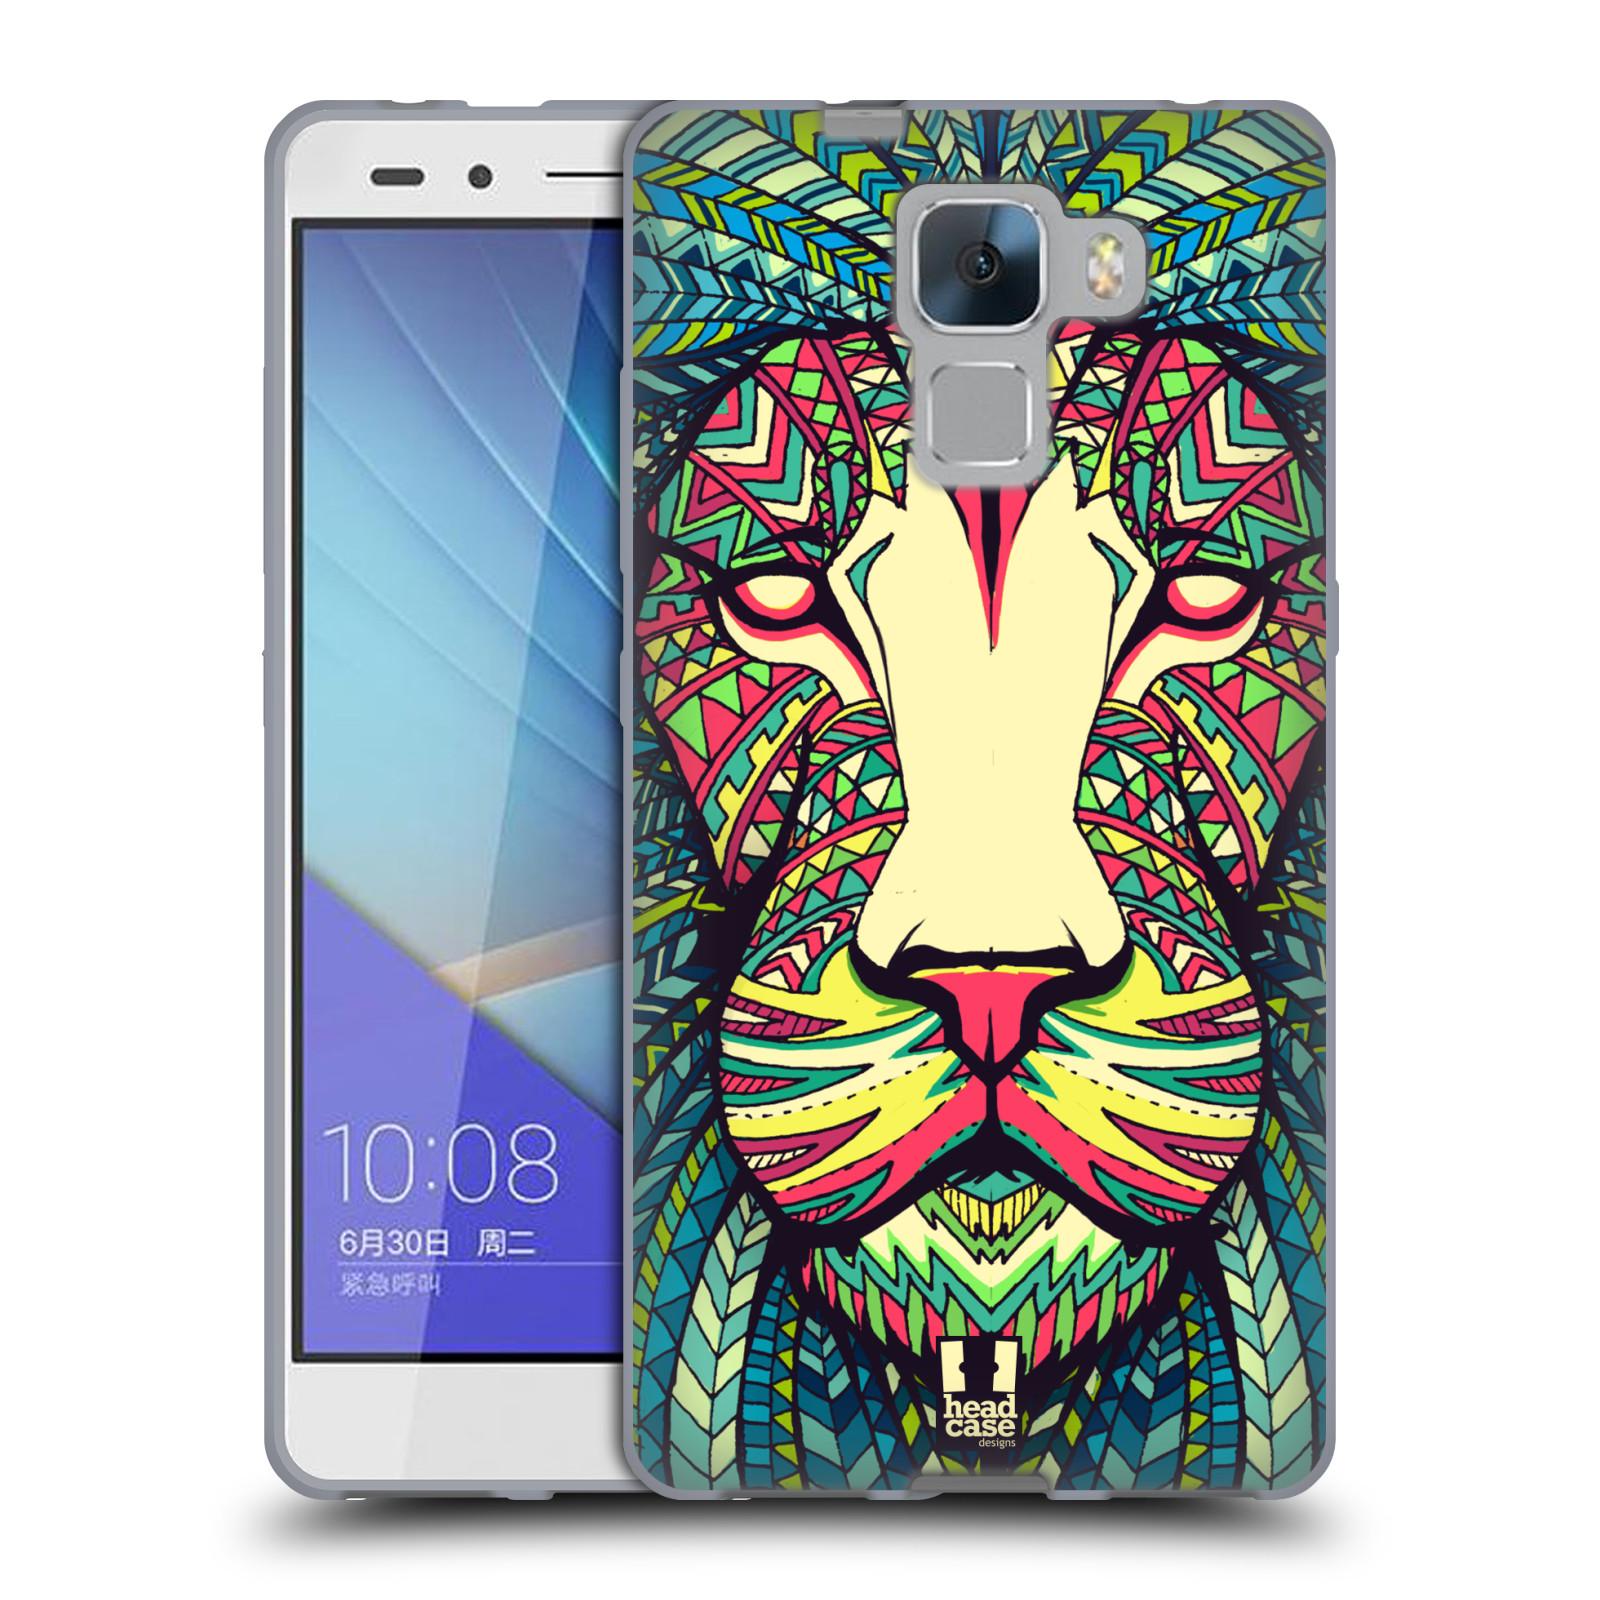 Silikonové pouzdro na mobil Honor 7 HEAD CASE AZTEC LEV